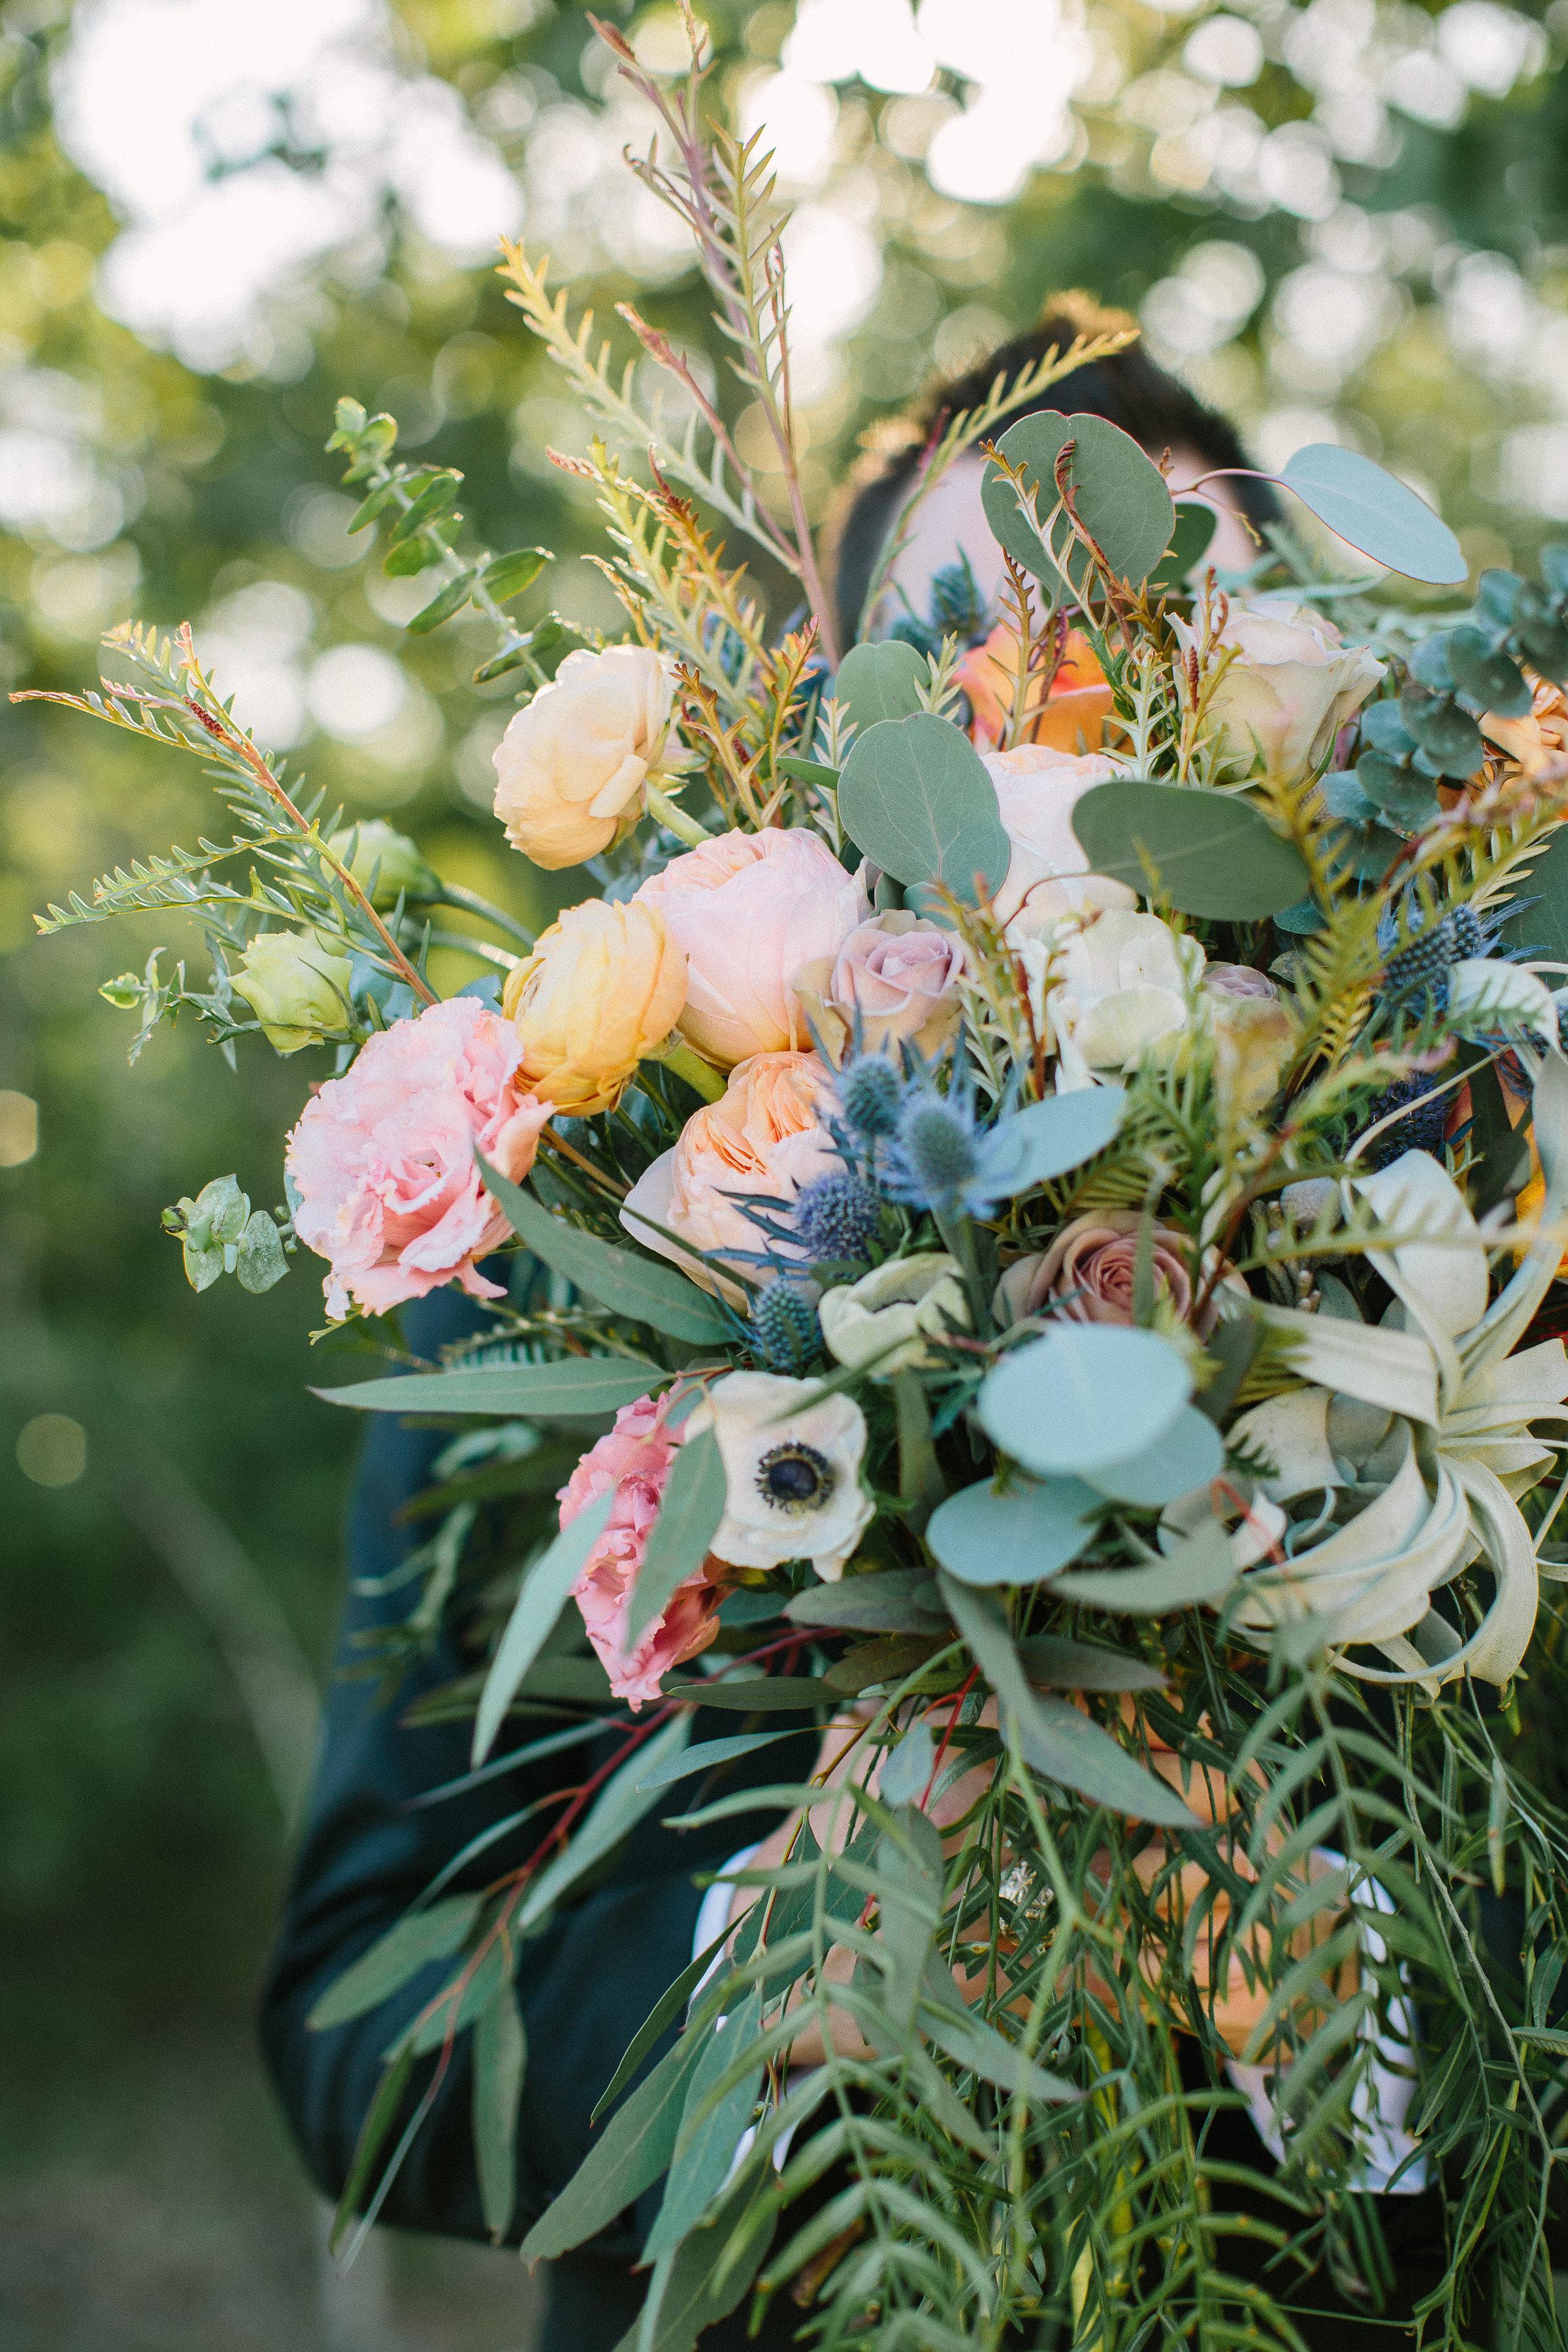 Ellen-Ashton-Photography-Peach-Creek-Ranch-Weddings-Wed-and-Prosper198